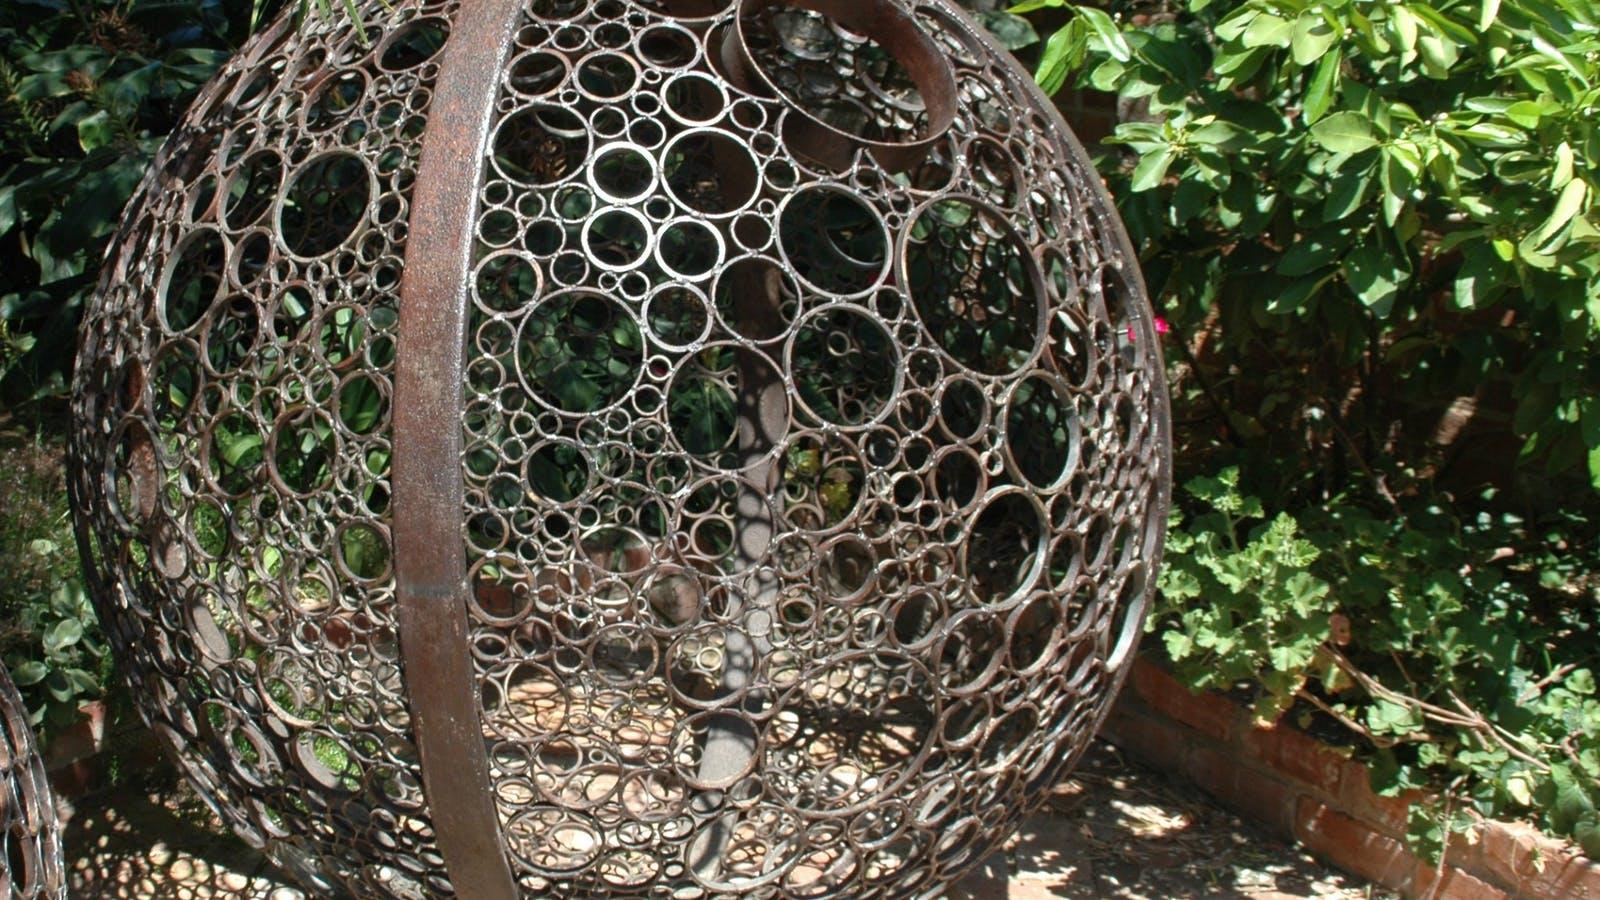 Metal ball sculpture at IGA in Rutherglen